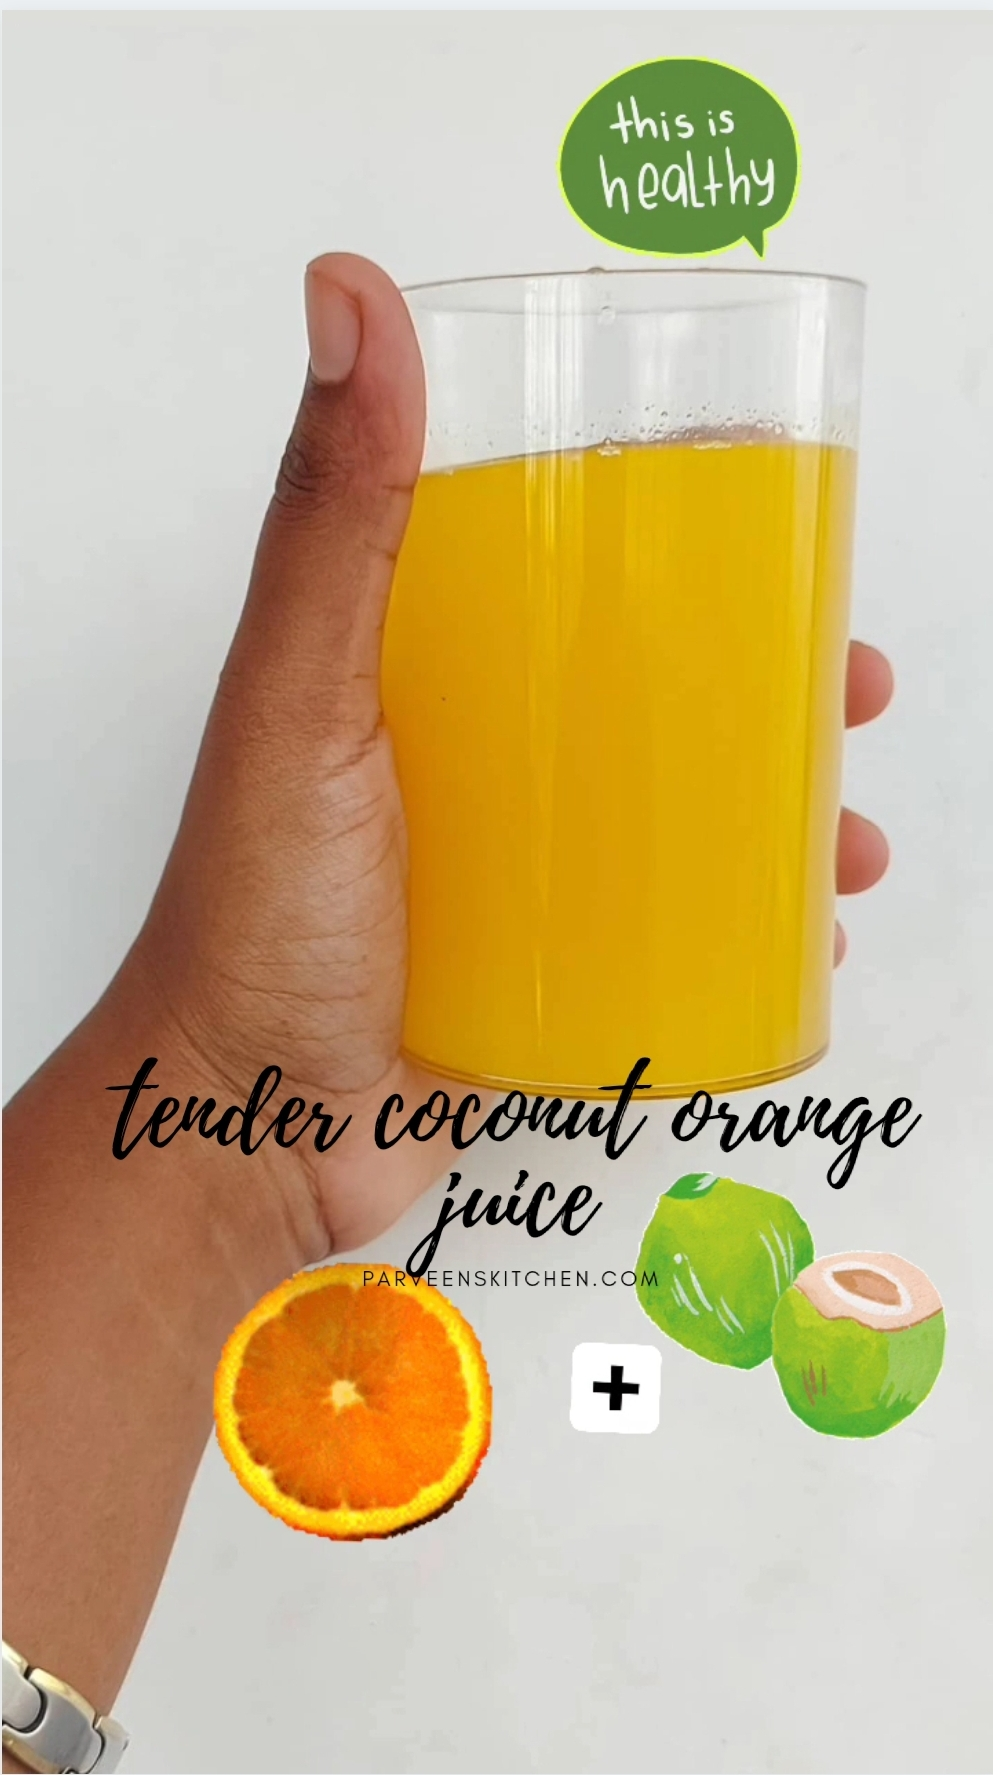 Tender coconut orange juice